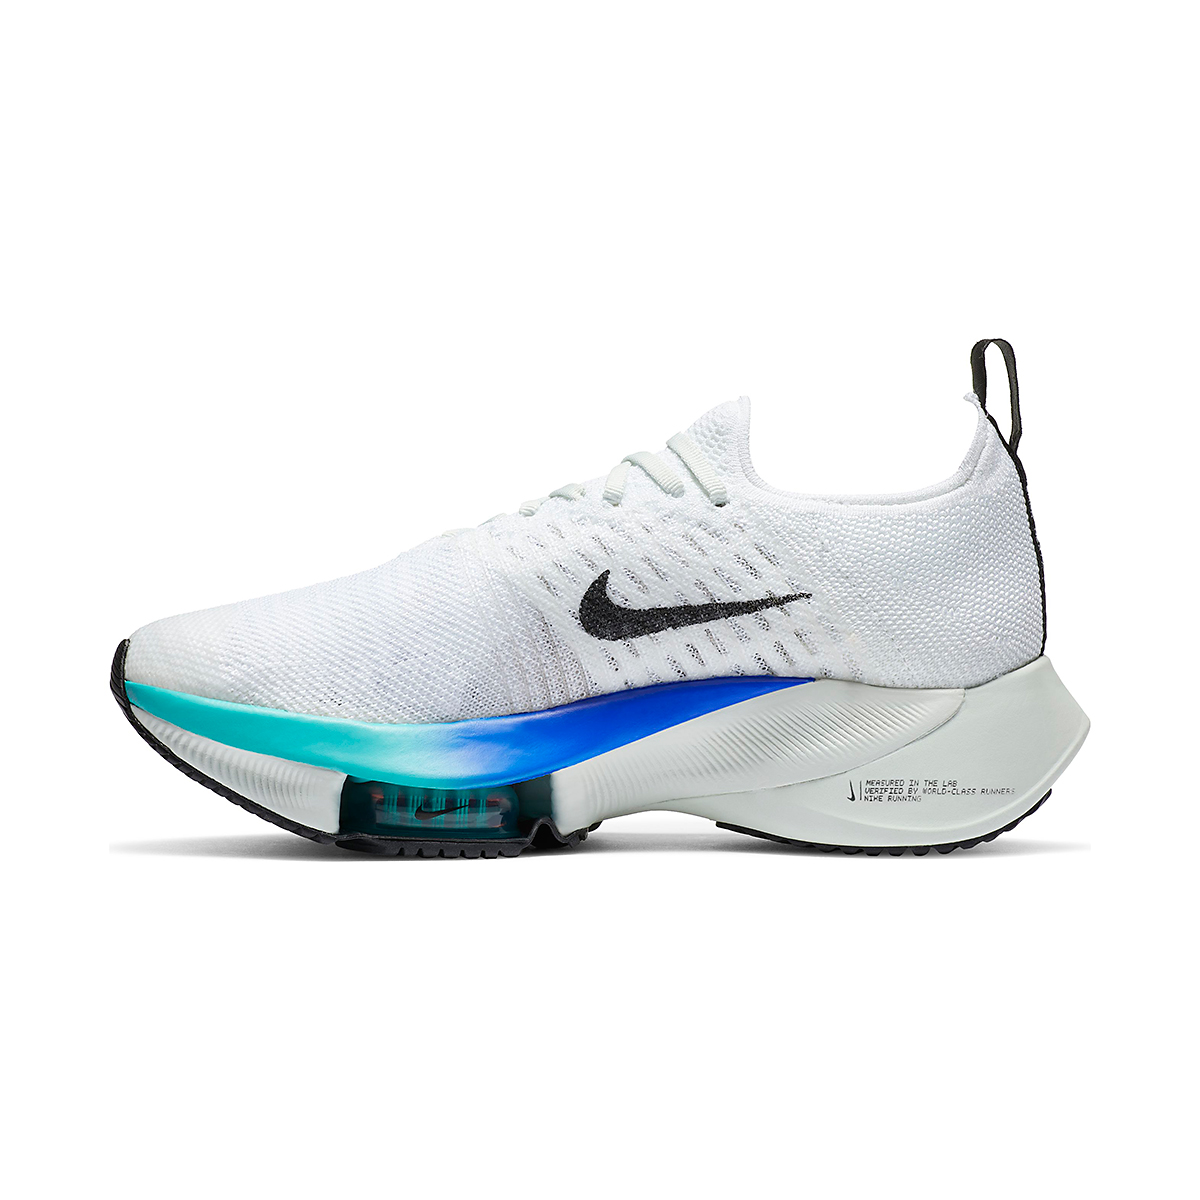 Women's Nike Air Zoom Tempo NEXT% Running Shoe - Color: White/Black-Hyper Violet-Flash Crimson  - Size: 5 - Width: Regular, White/Black-Hyper Violet-Flash Crimson, large, image 2